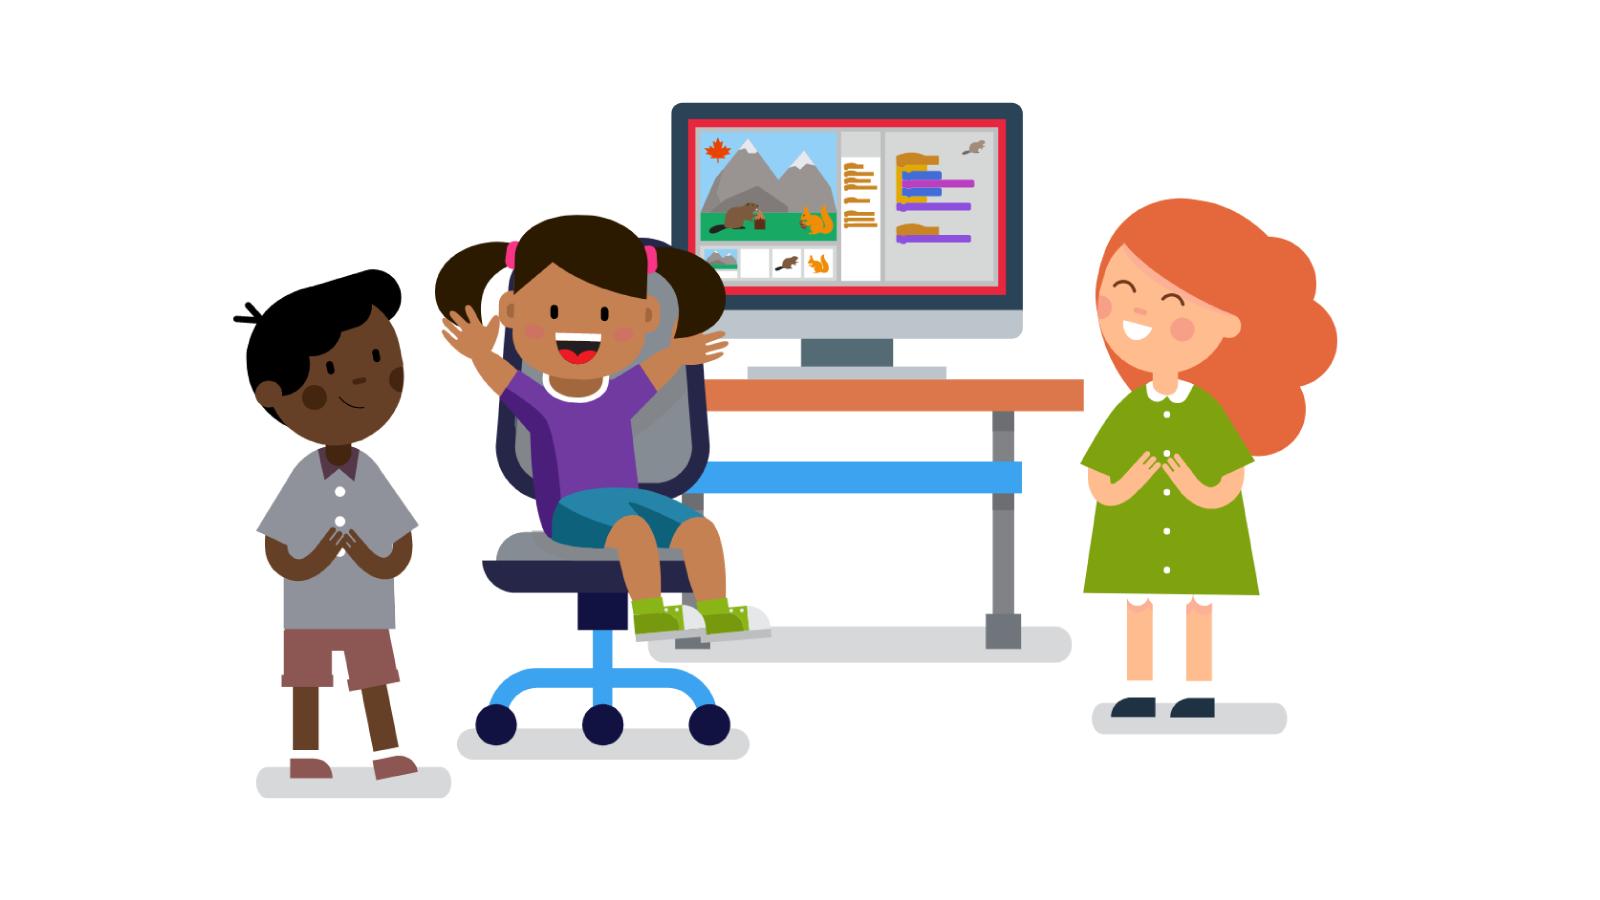 Illustration of cartoon children designing on computer.